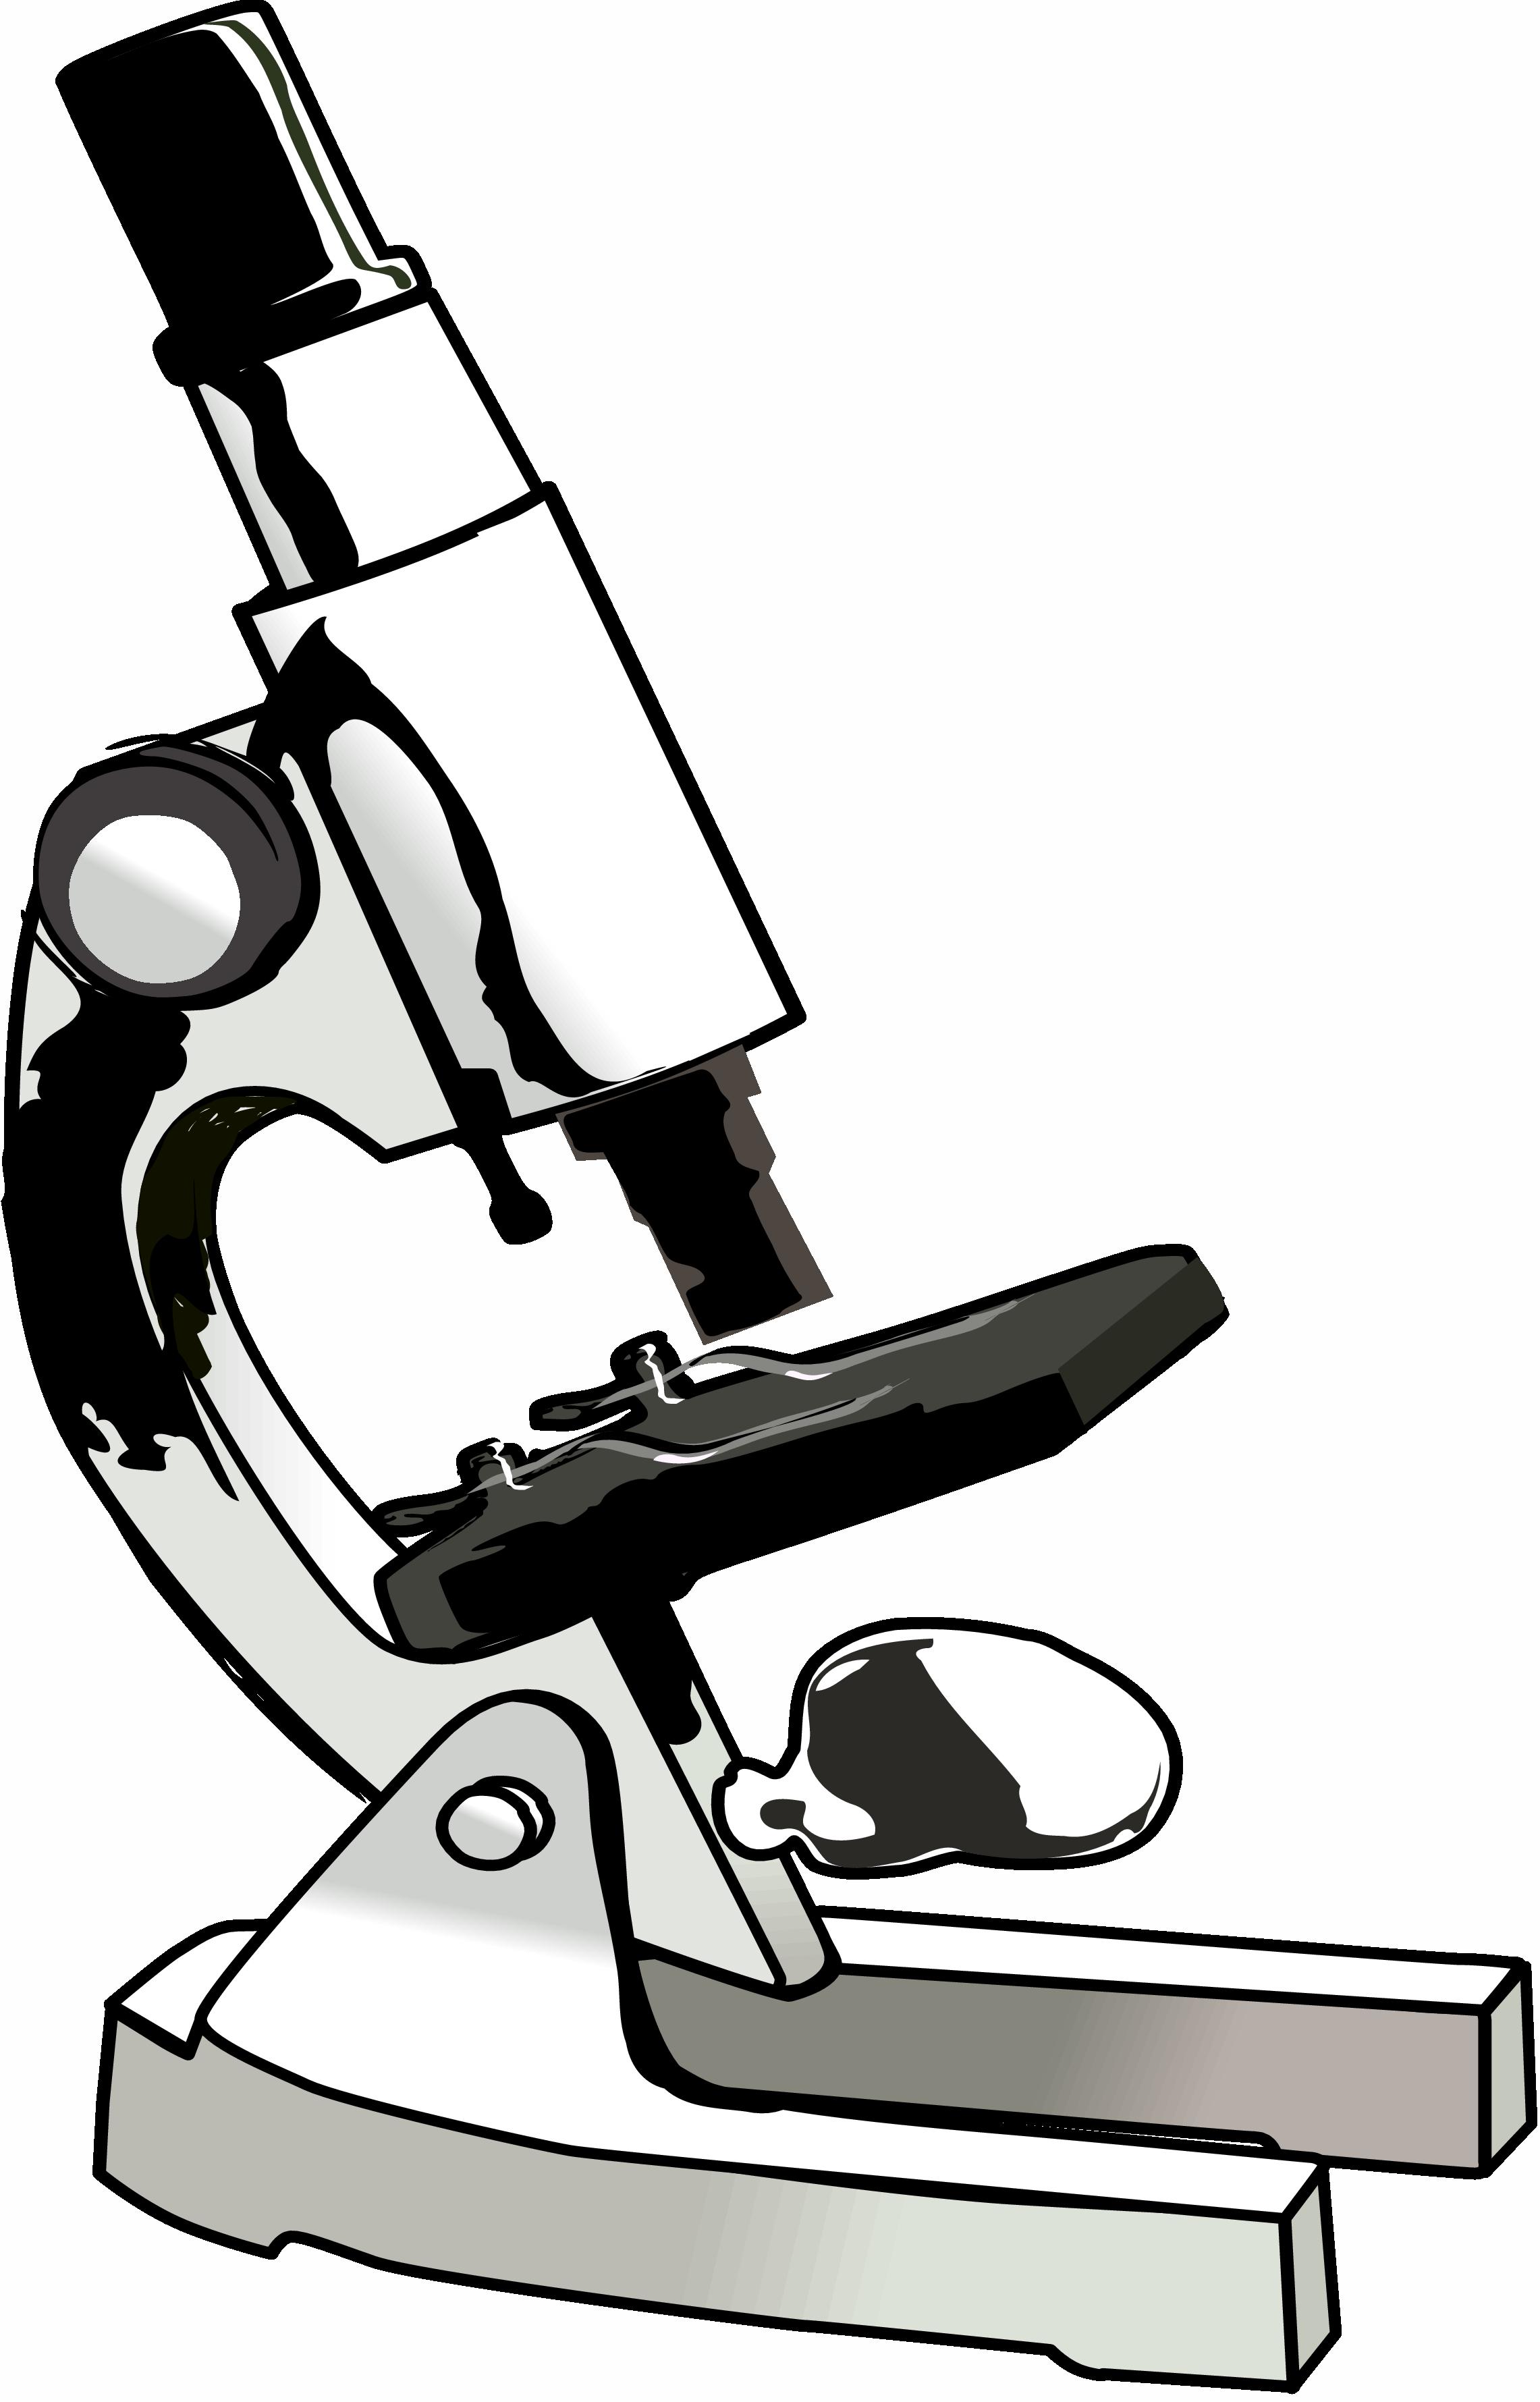 Microscope diagram for kids clipart panda free clipart images microscope20diagram ccuart Image collections